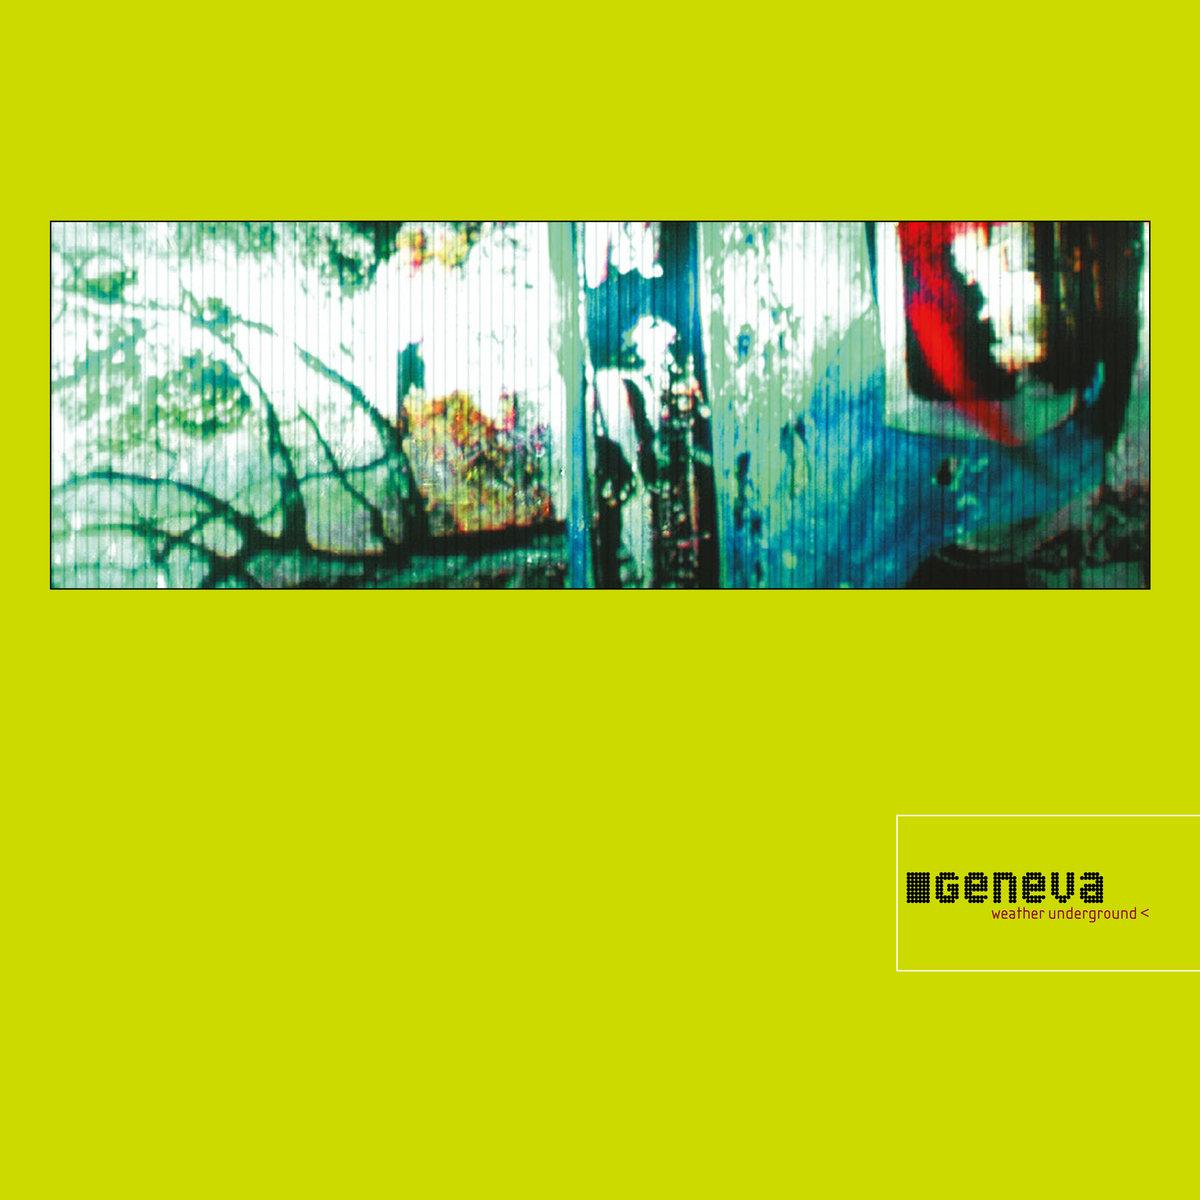 Weather Underground (Remastered Deluxe Edition)